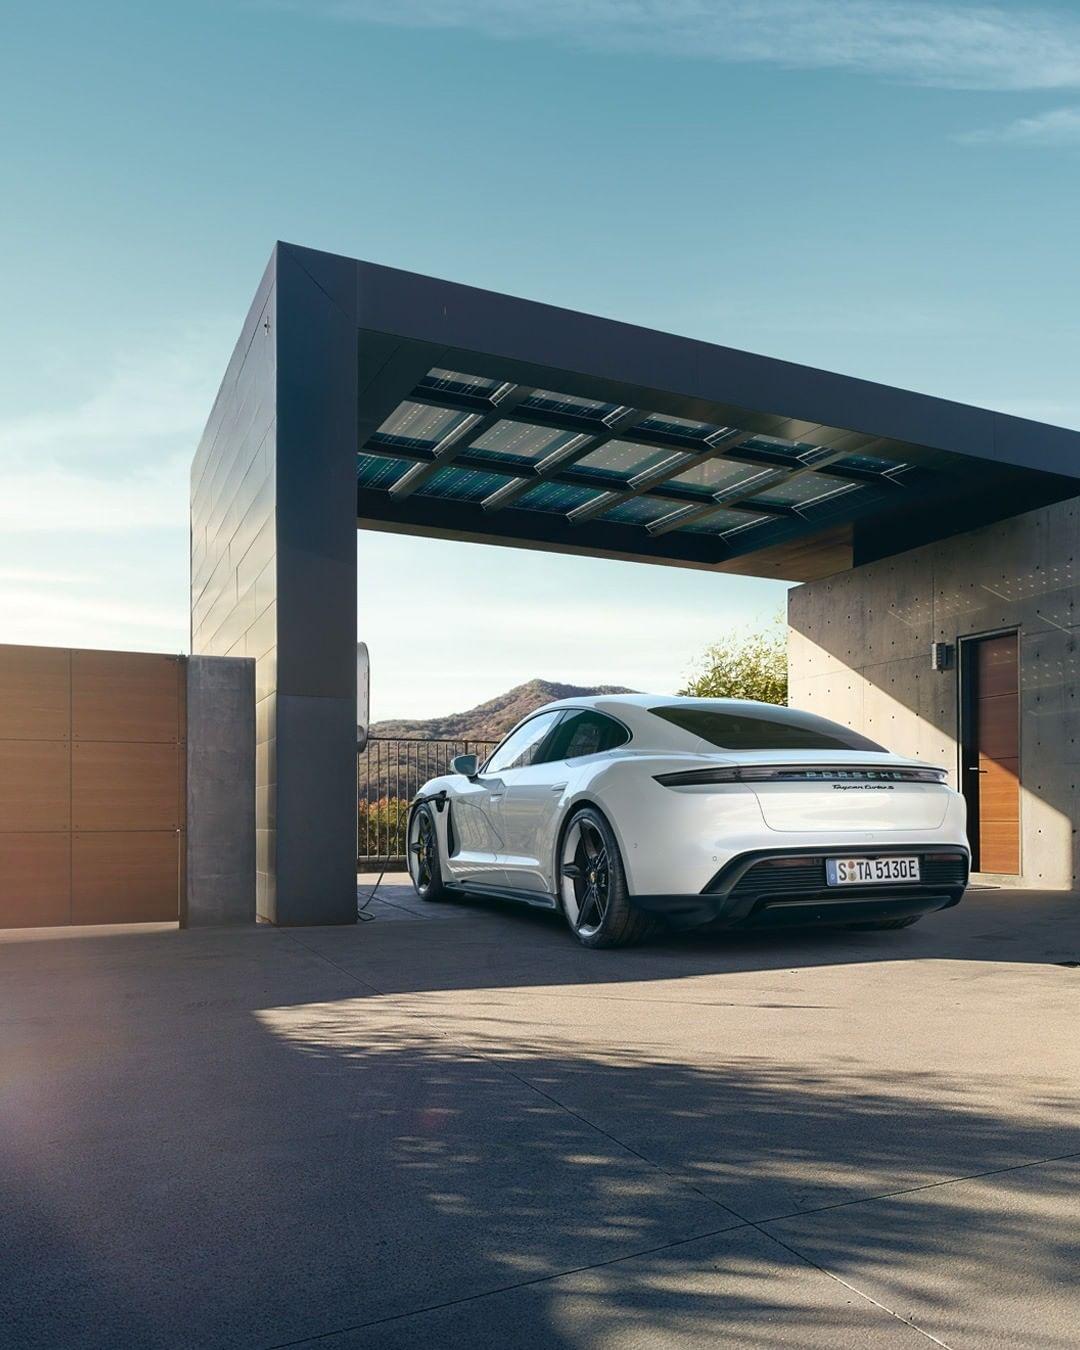 Porsche Taycan 2020, mobil listrik berperforma 751HP dirilis